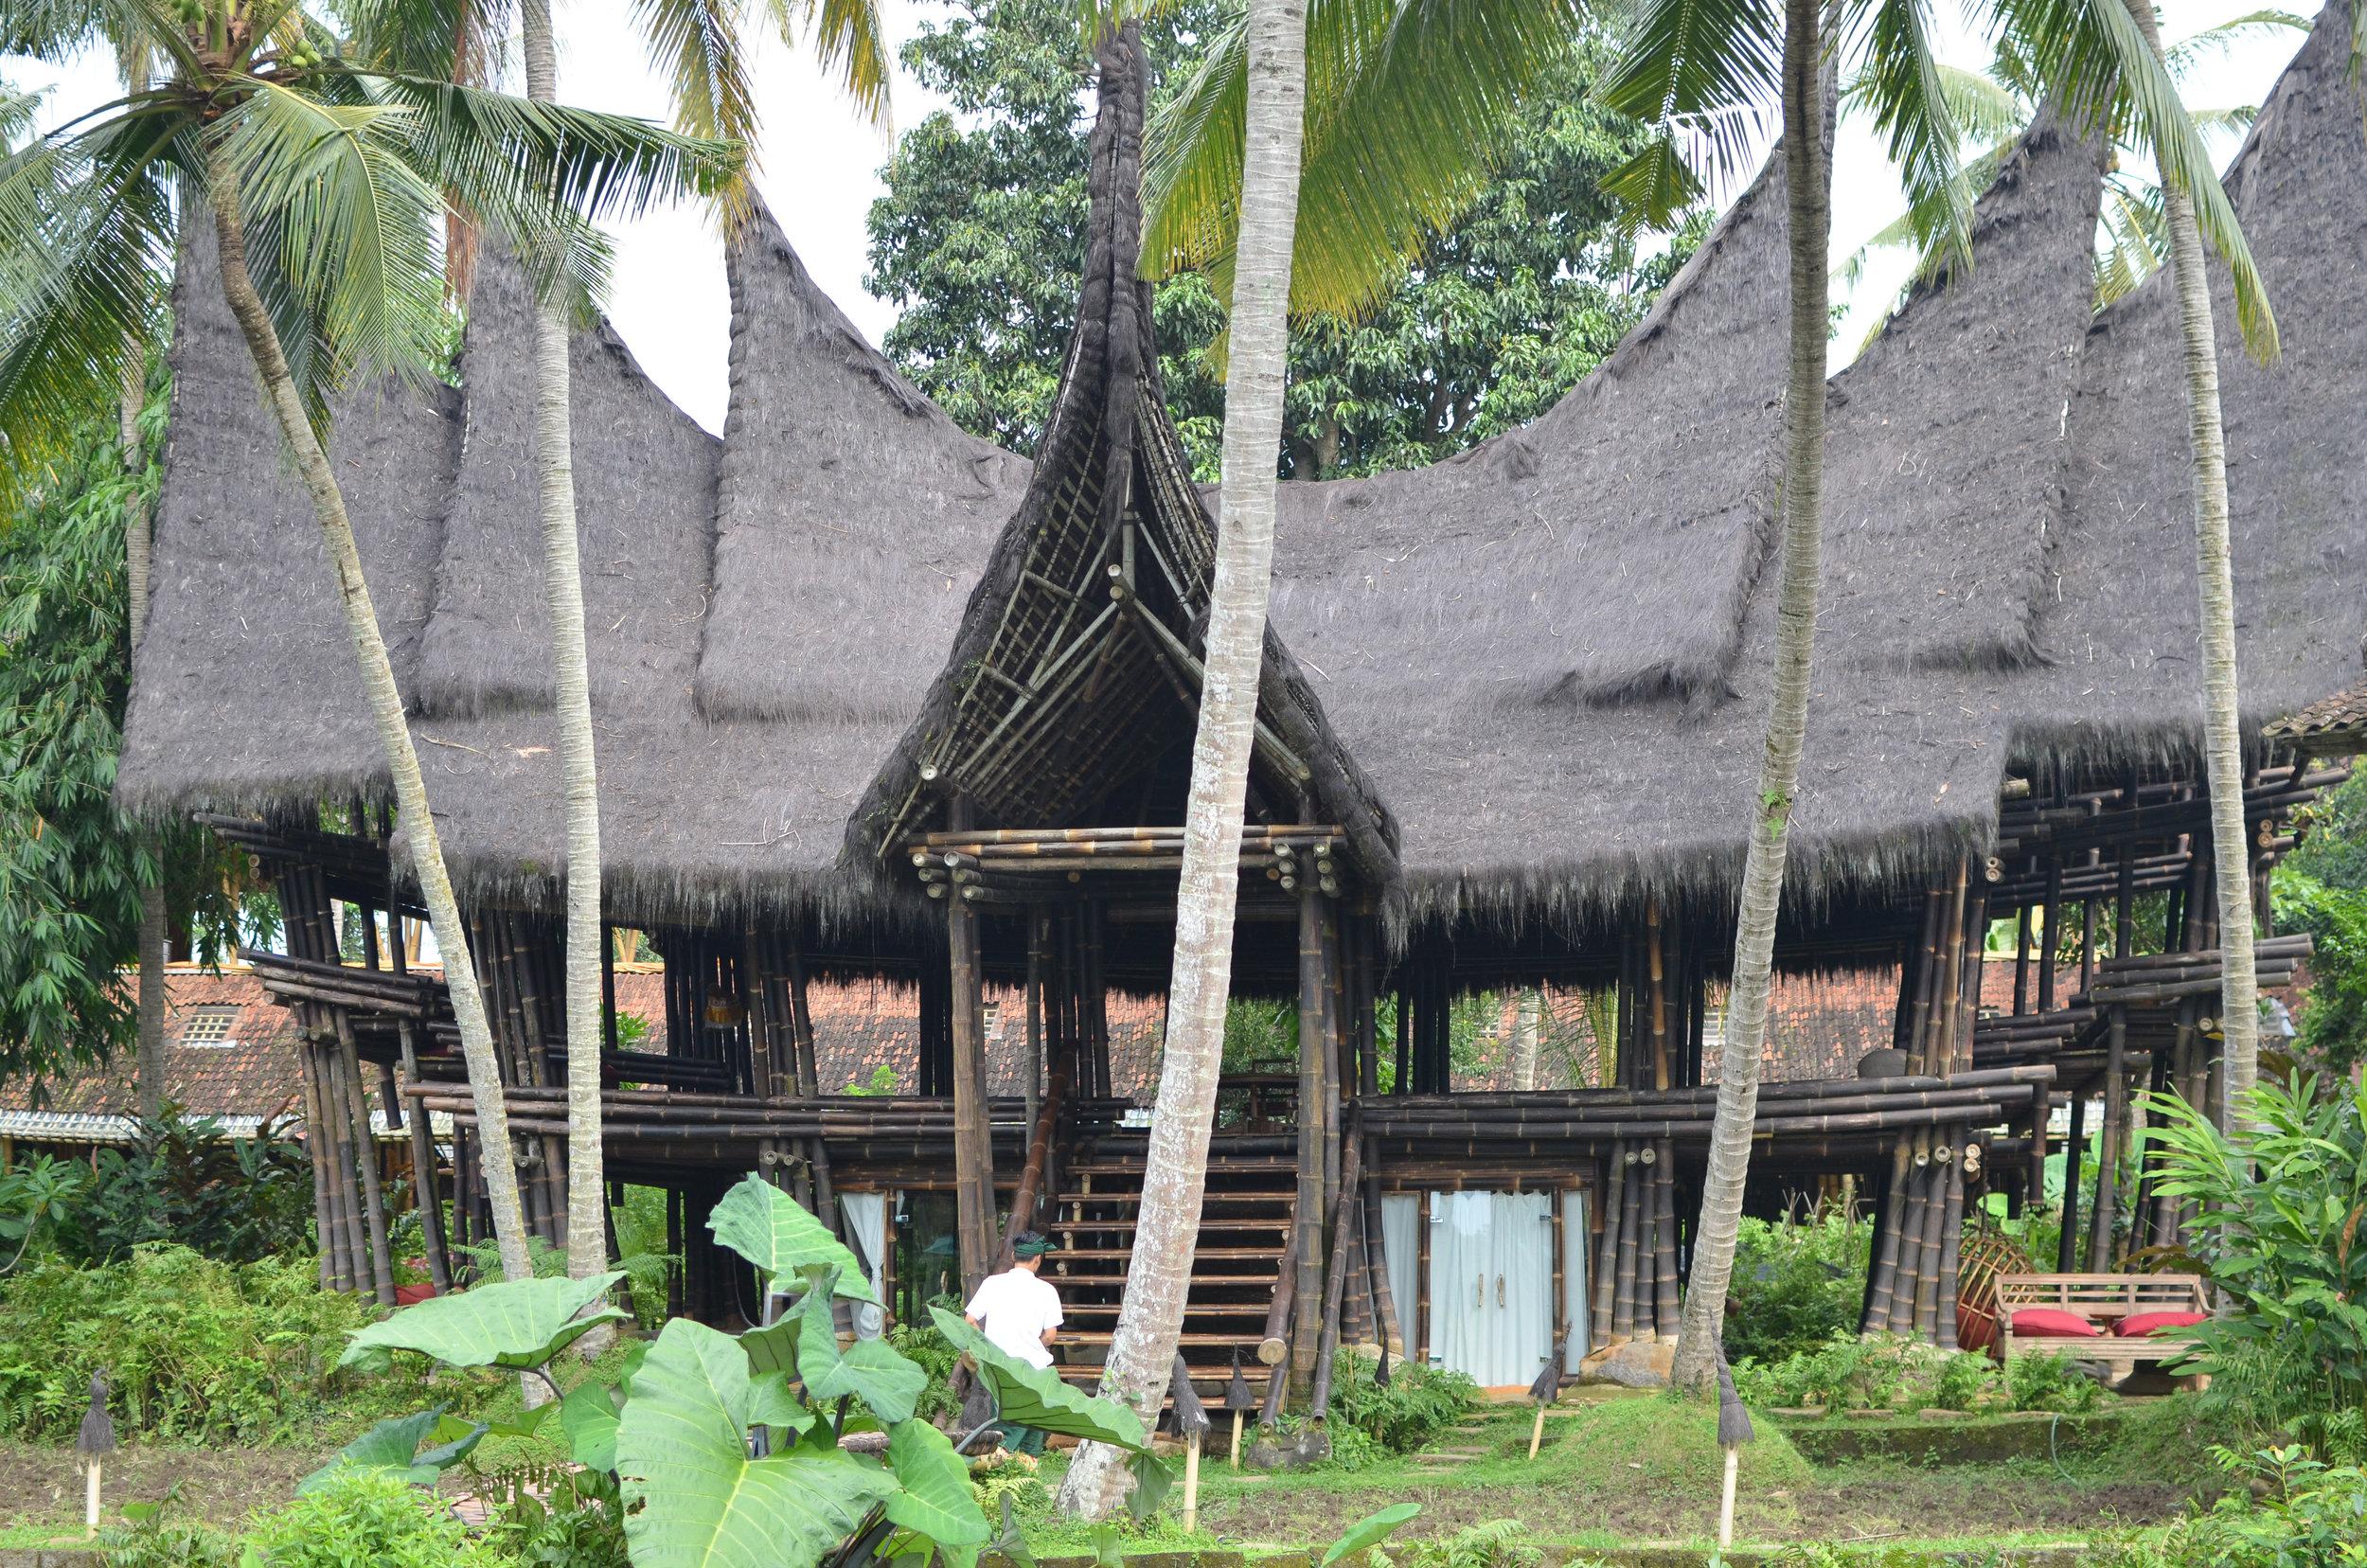 bali+mosca+bamboo+lodge+bali+ubud+lifeonpine_DSC_2815.jpg